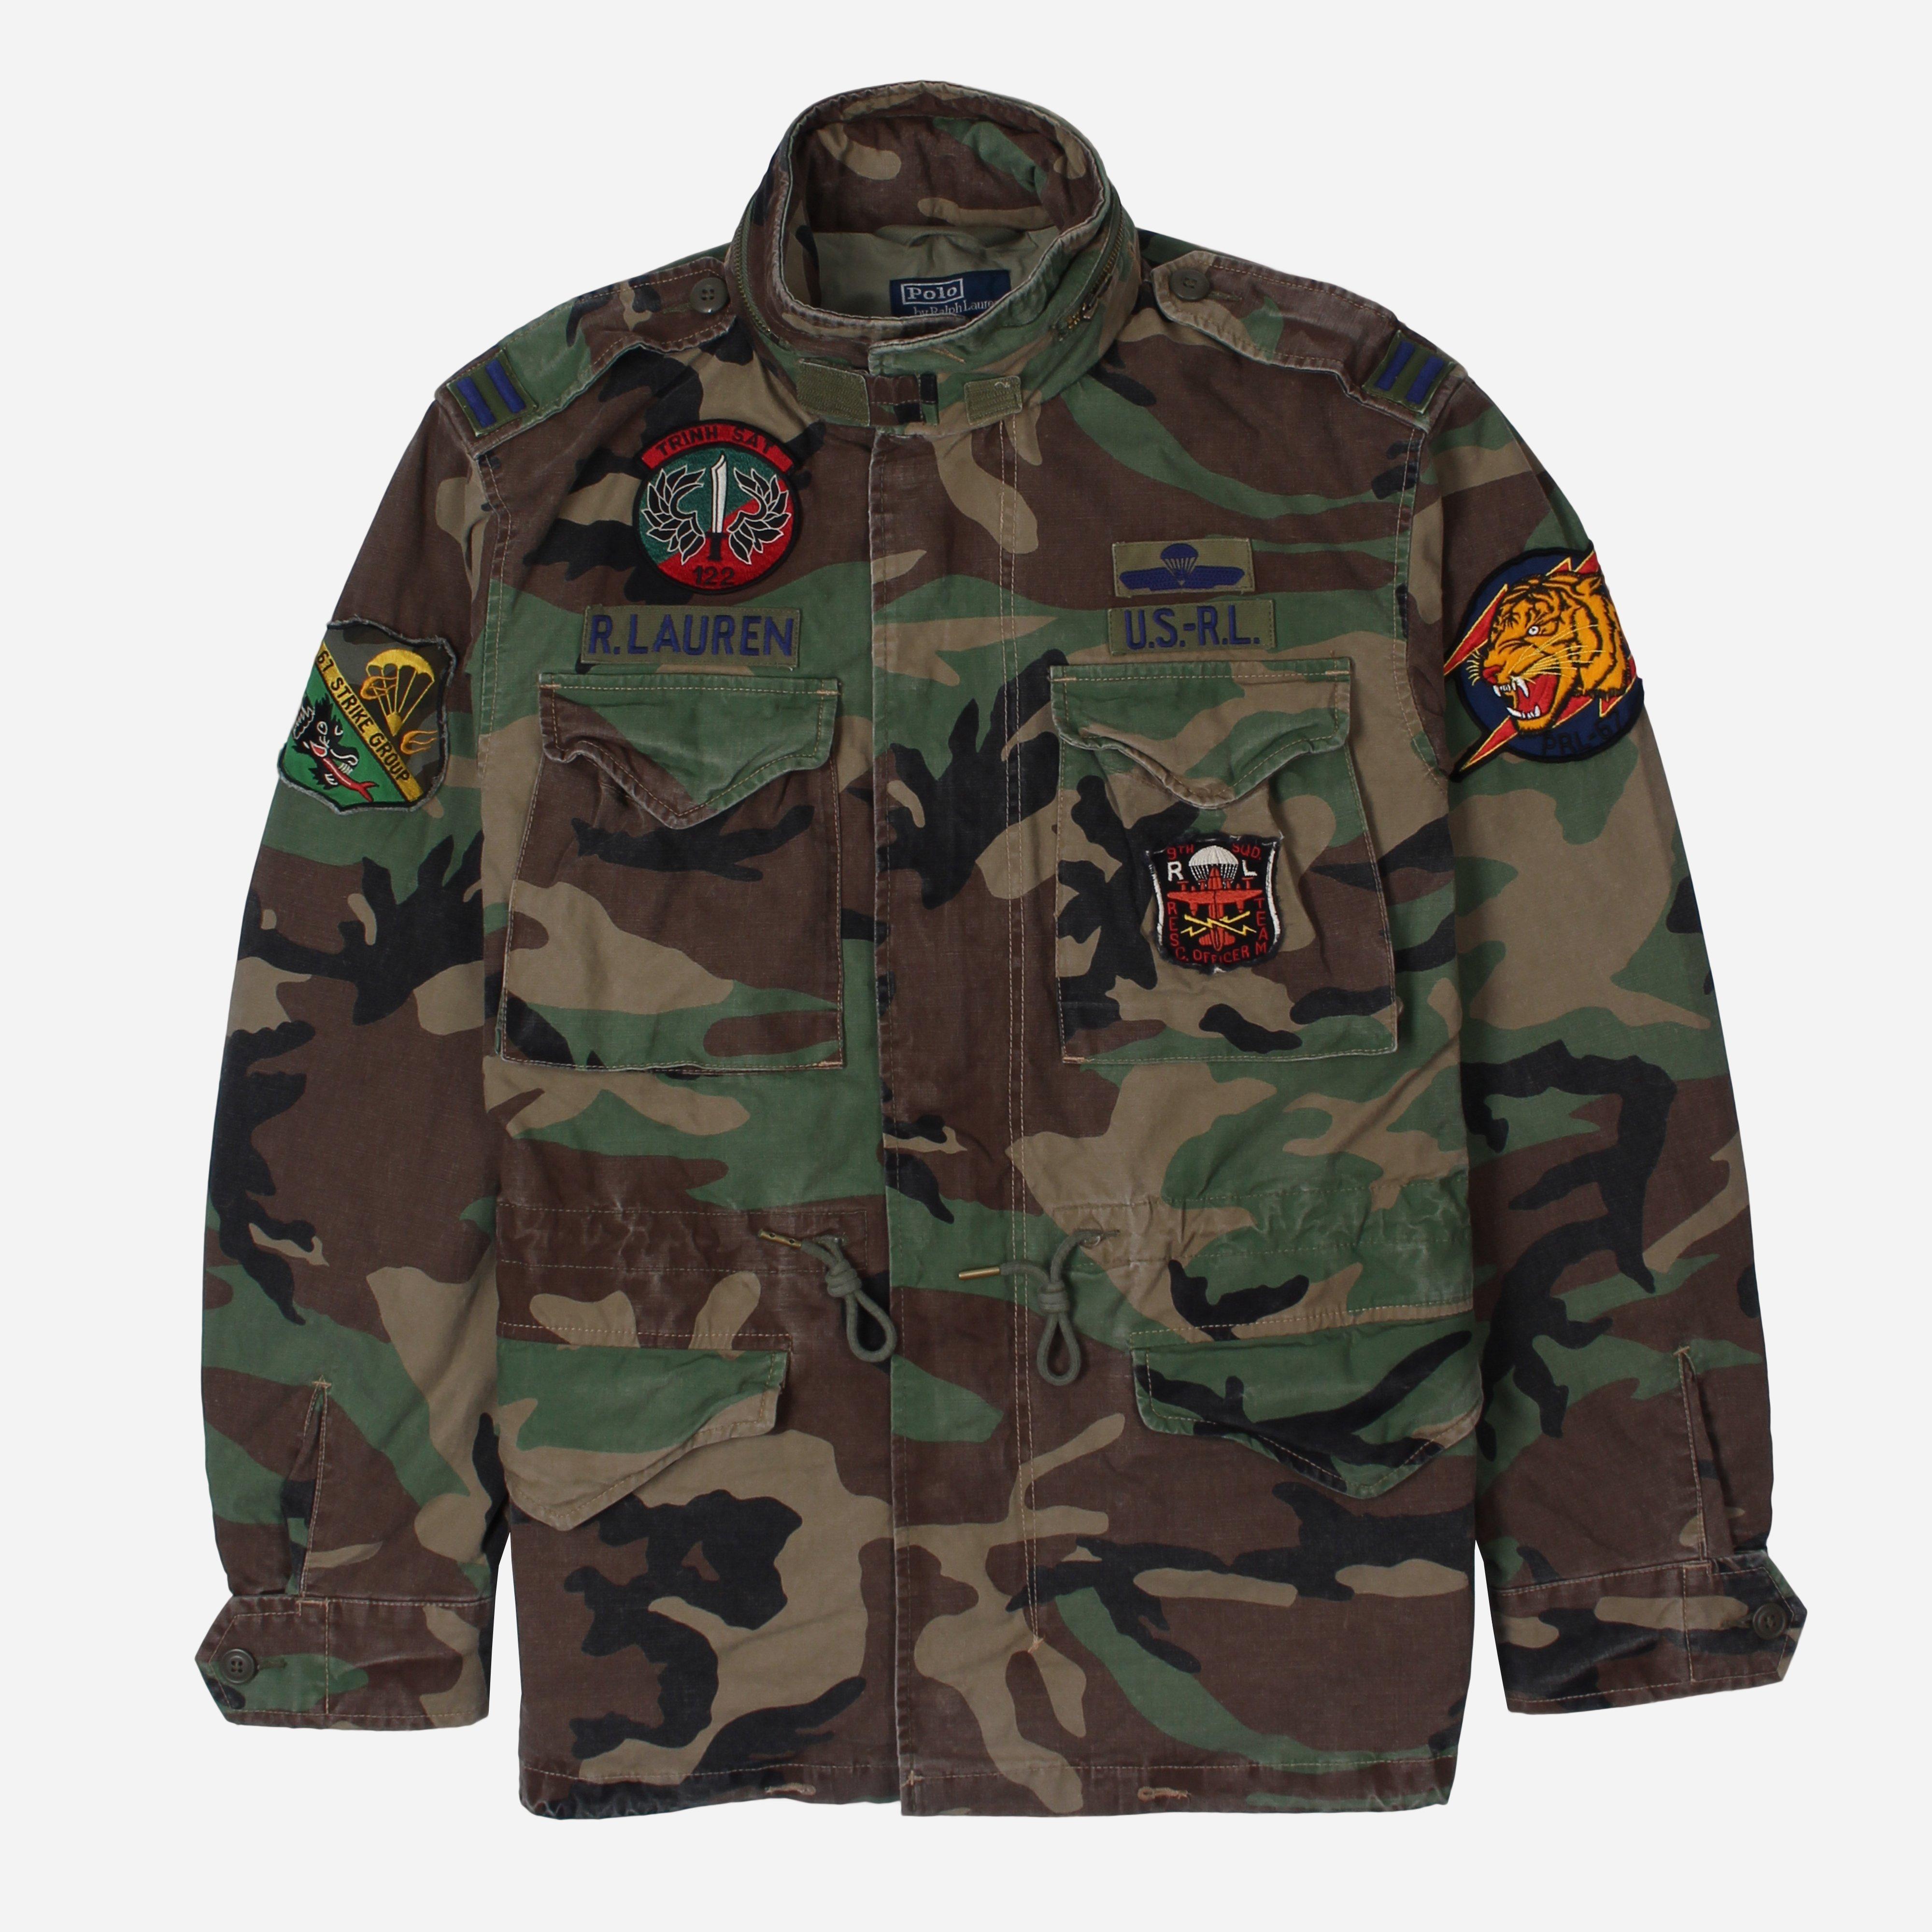 Polo Ralph Lauren Camo Field Jacket in Green for Men - Lyst